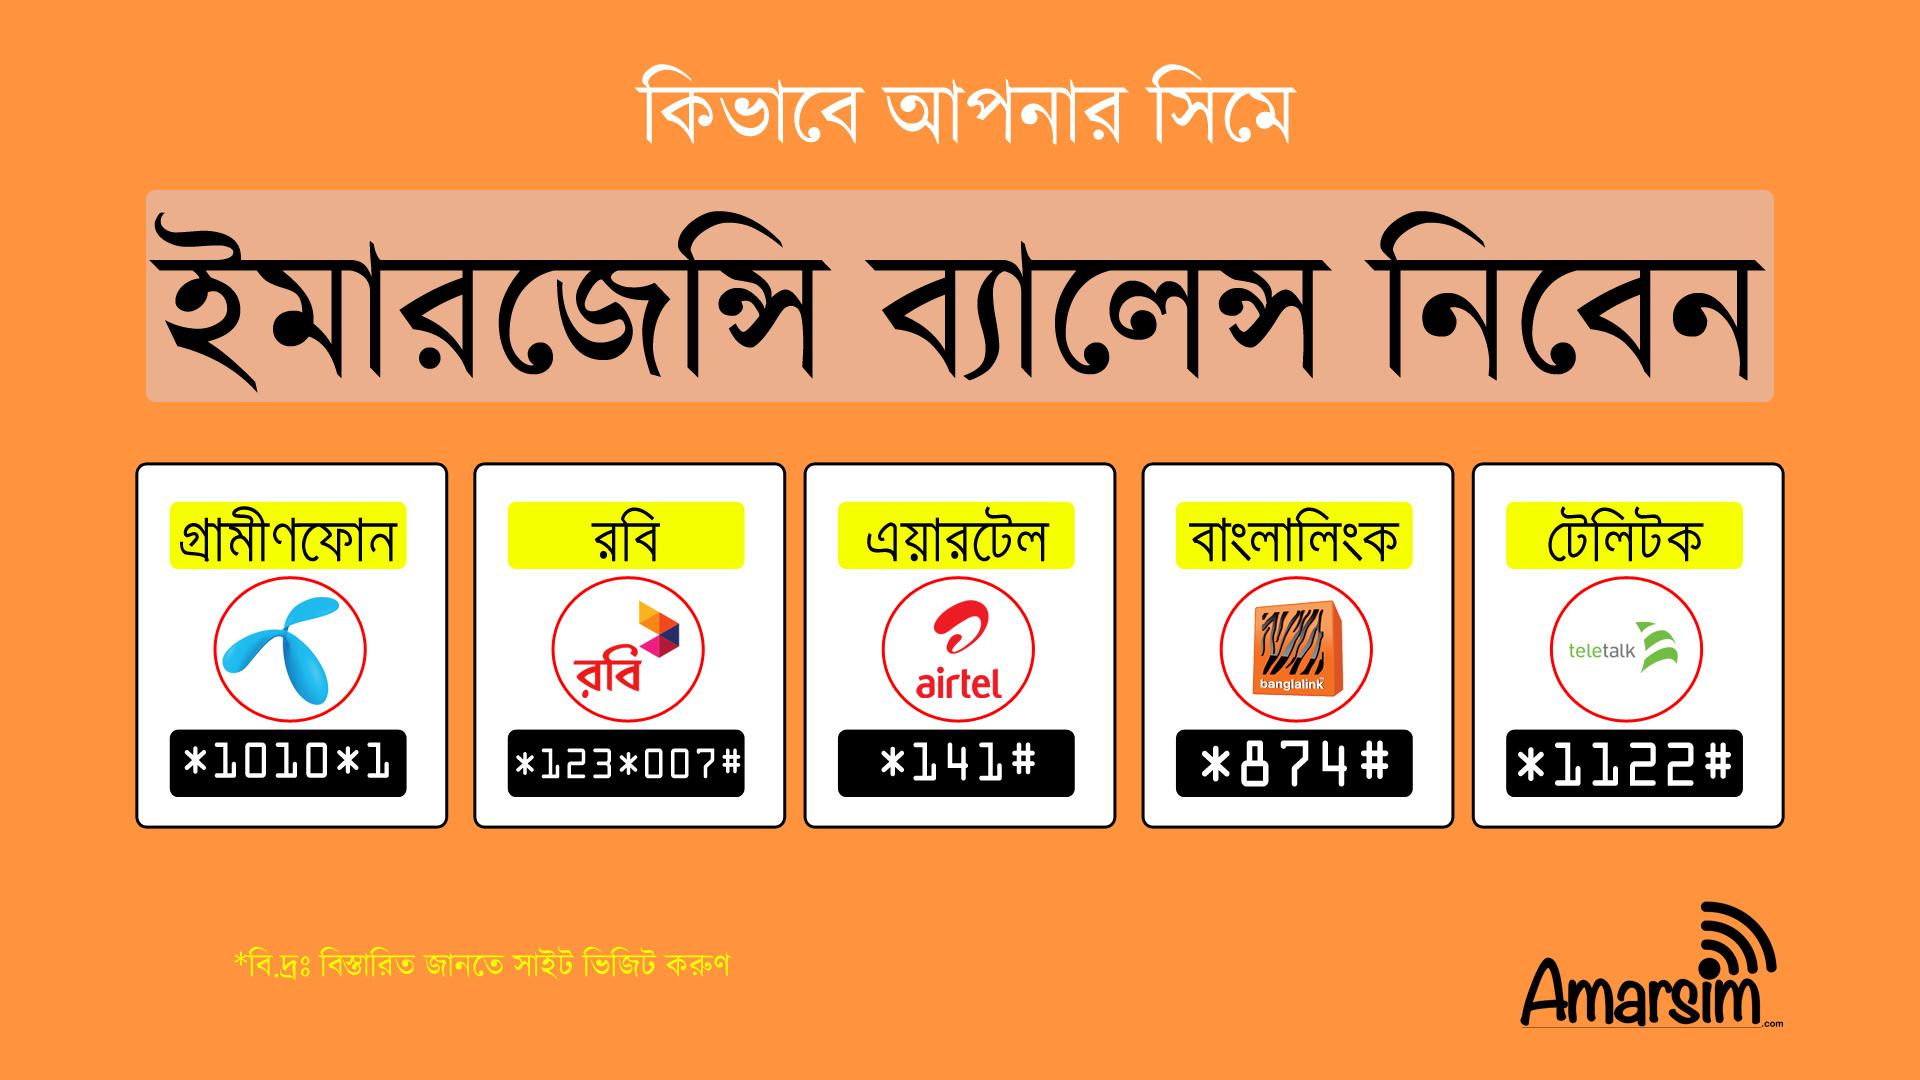 How to Get Emergency Balance of GP, Robi, Airtel, Teletalk and Banglink